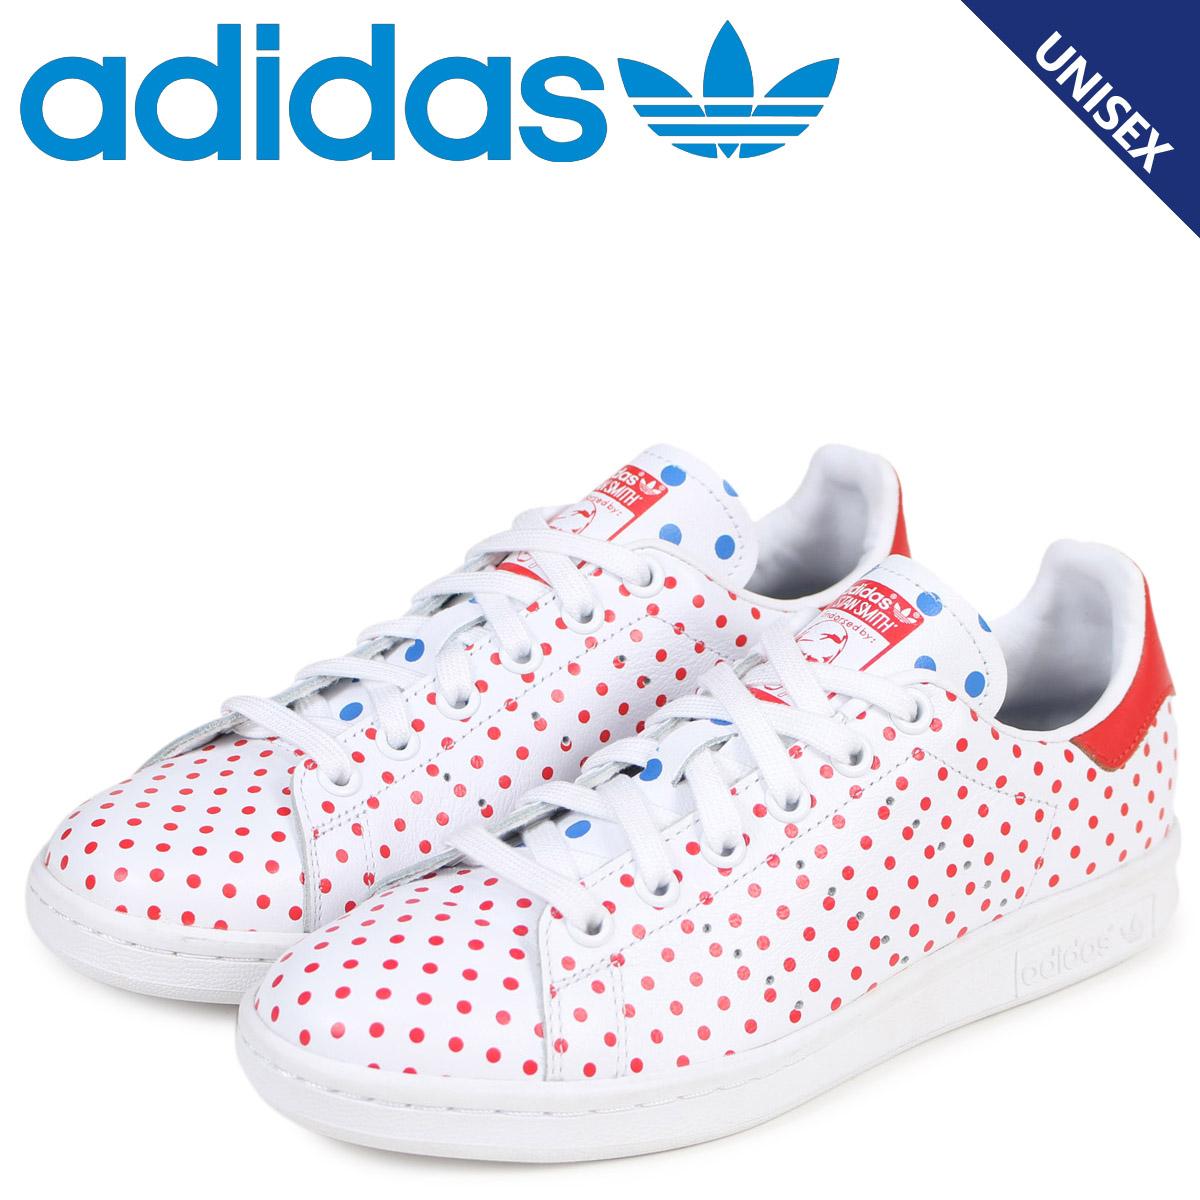 01e68639272ef9 adidas Originals Stan Smith Adidas sneakers Farrell Williams PW STAN SMITH  SPD men gap Dis collaboration B25401 white originals  load planned Shinnyu  load ...